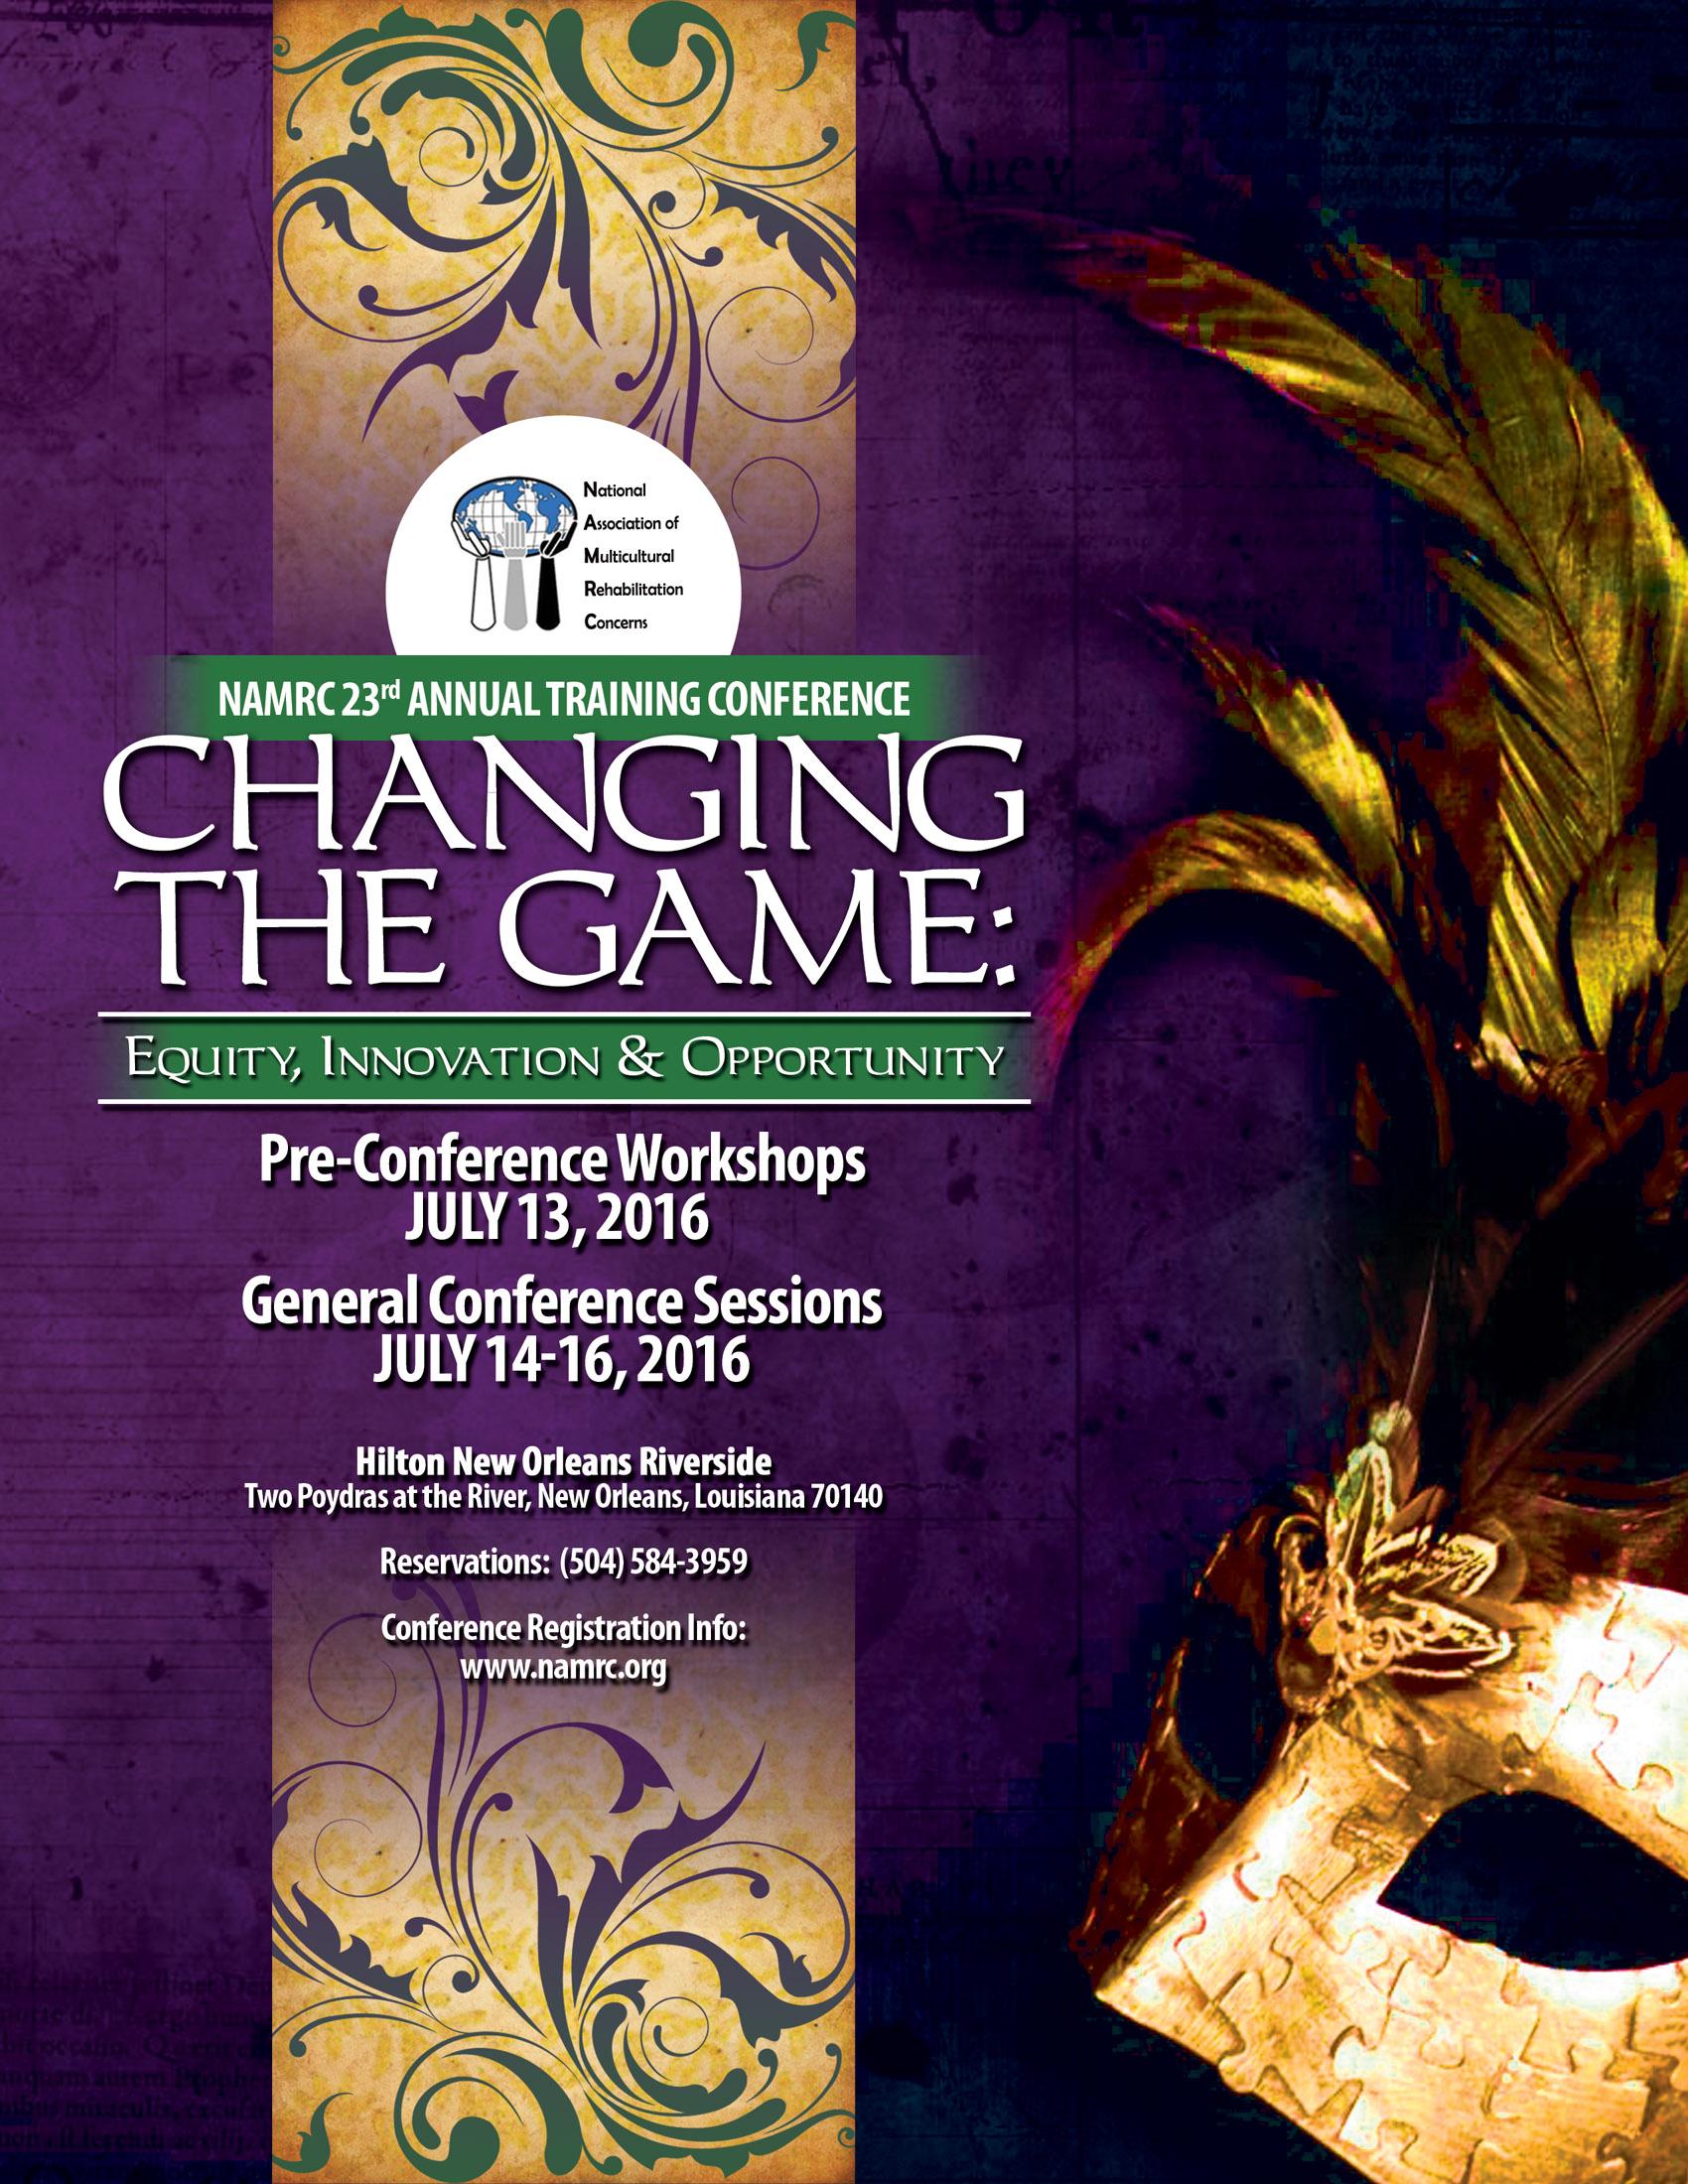 2016 NAMRC Conference Main Art